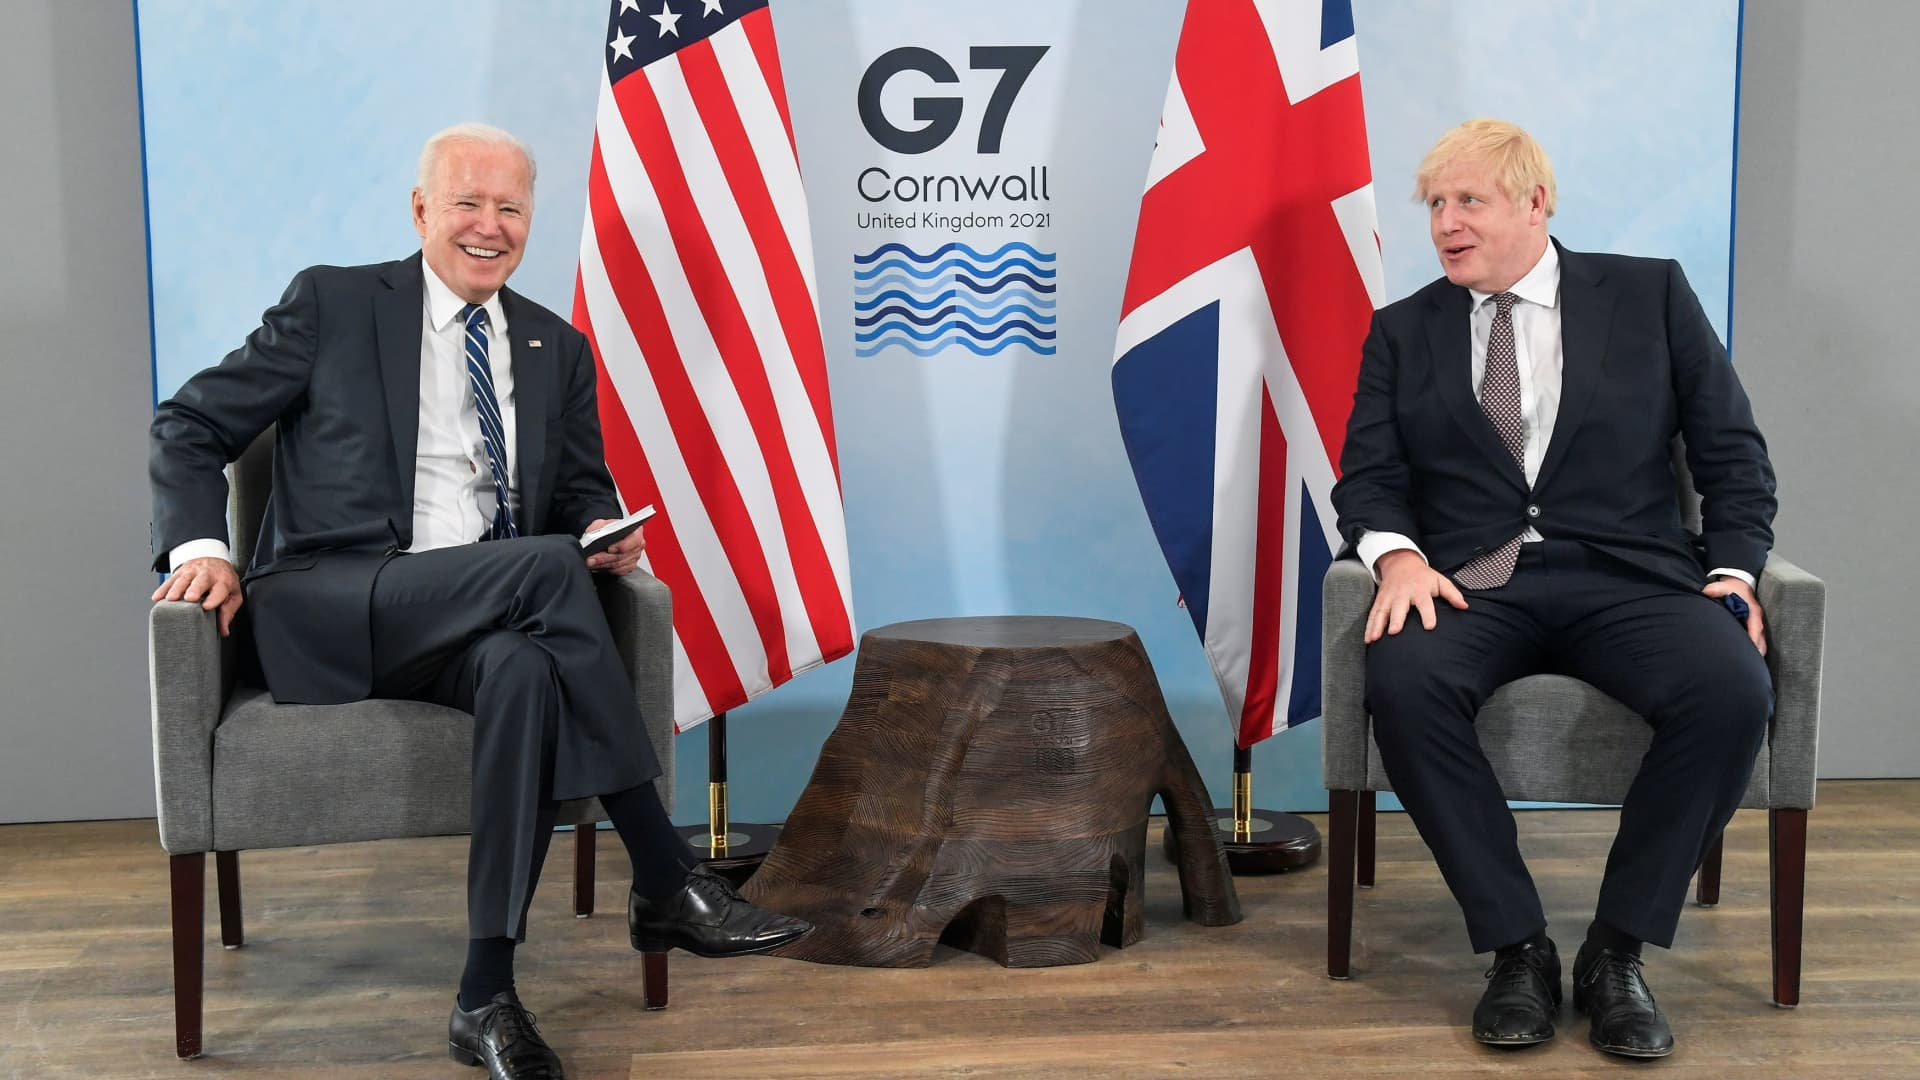 Britain's Prime Minister Boris Johnson speaks with U.S. President Joe Biden during their meeting, ahead of the G7 summit, at Carbis Bay, Cornwall, Britain June 10, 2021.